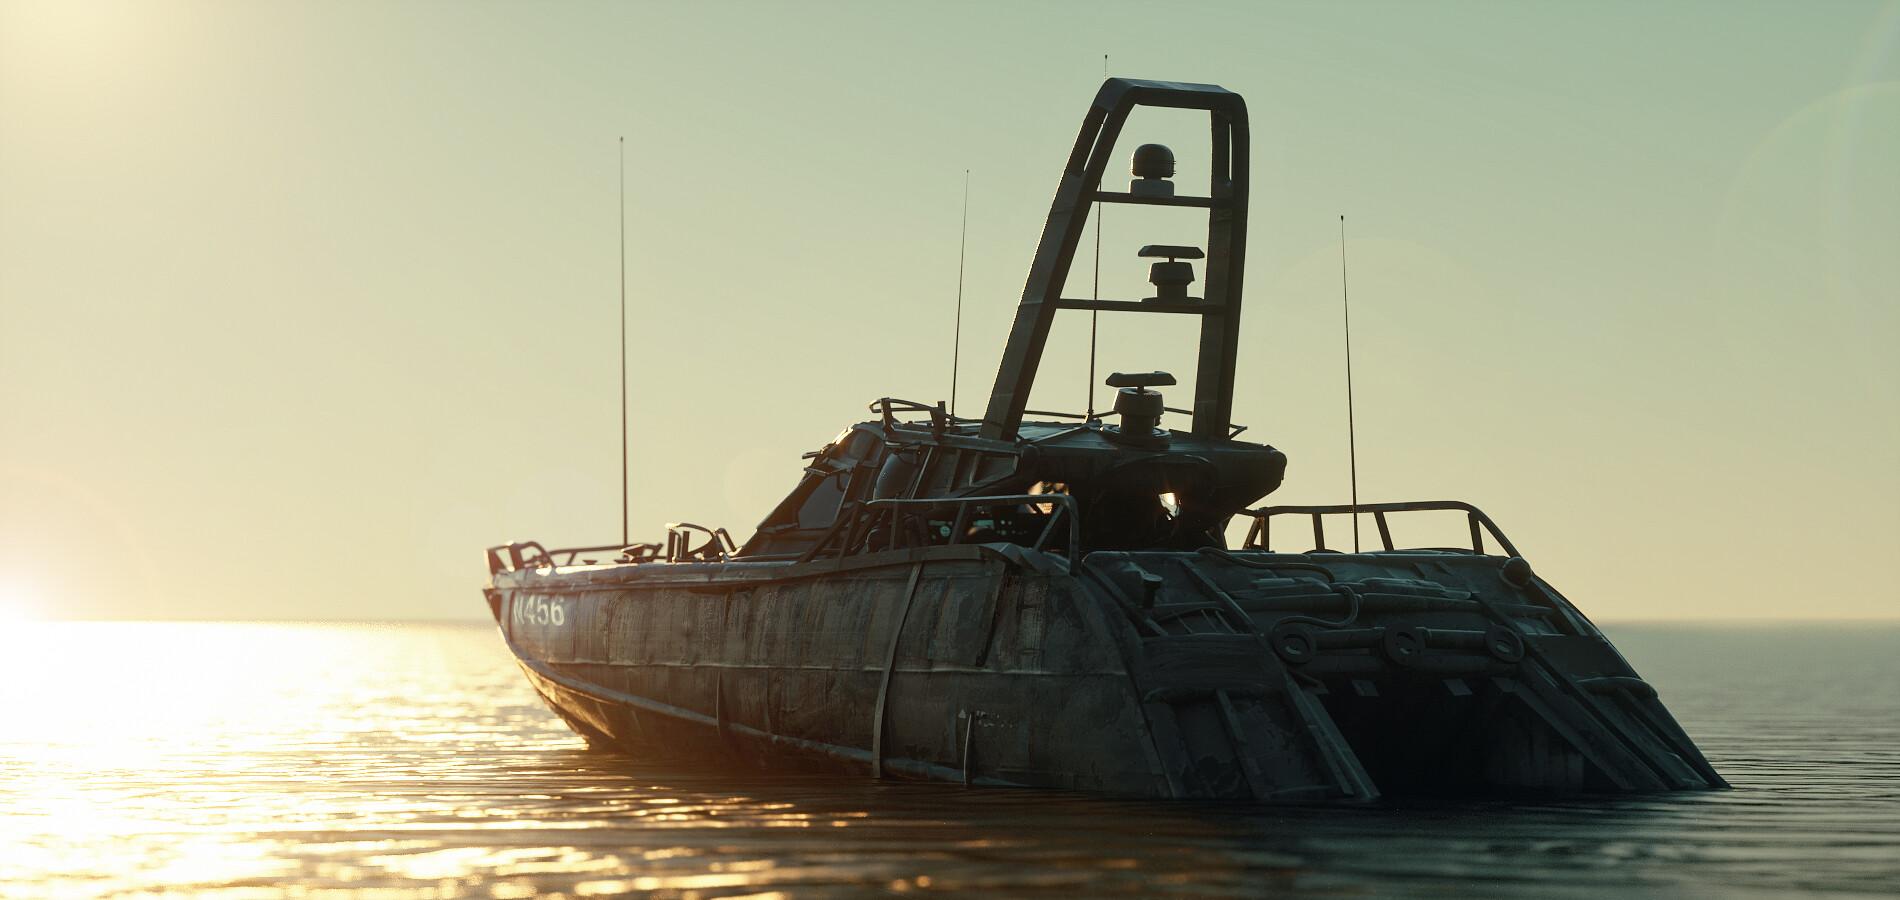 Rene aigner boat02